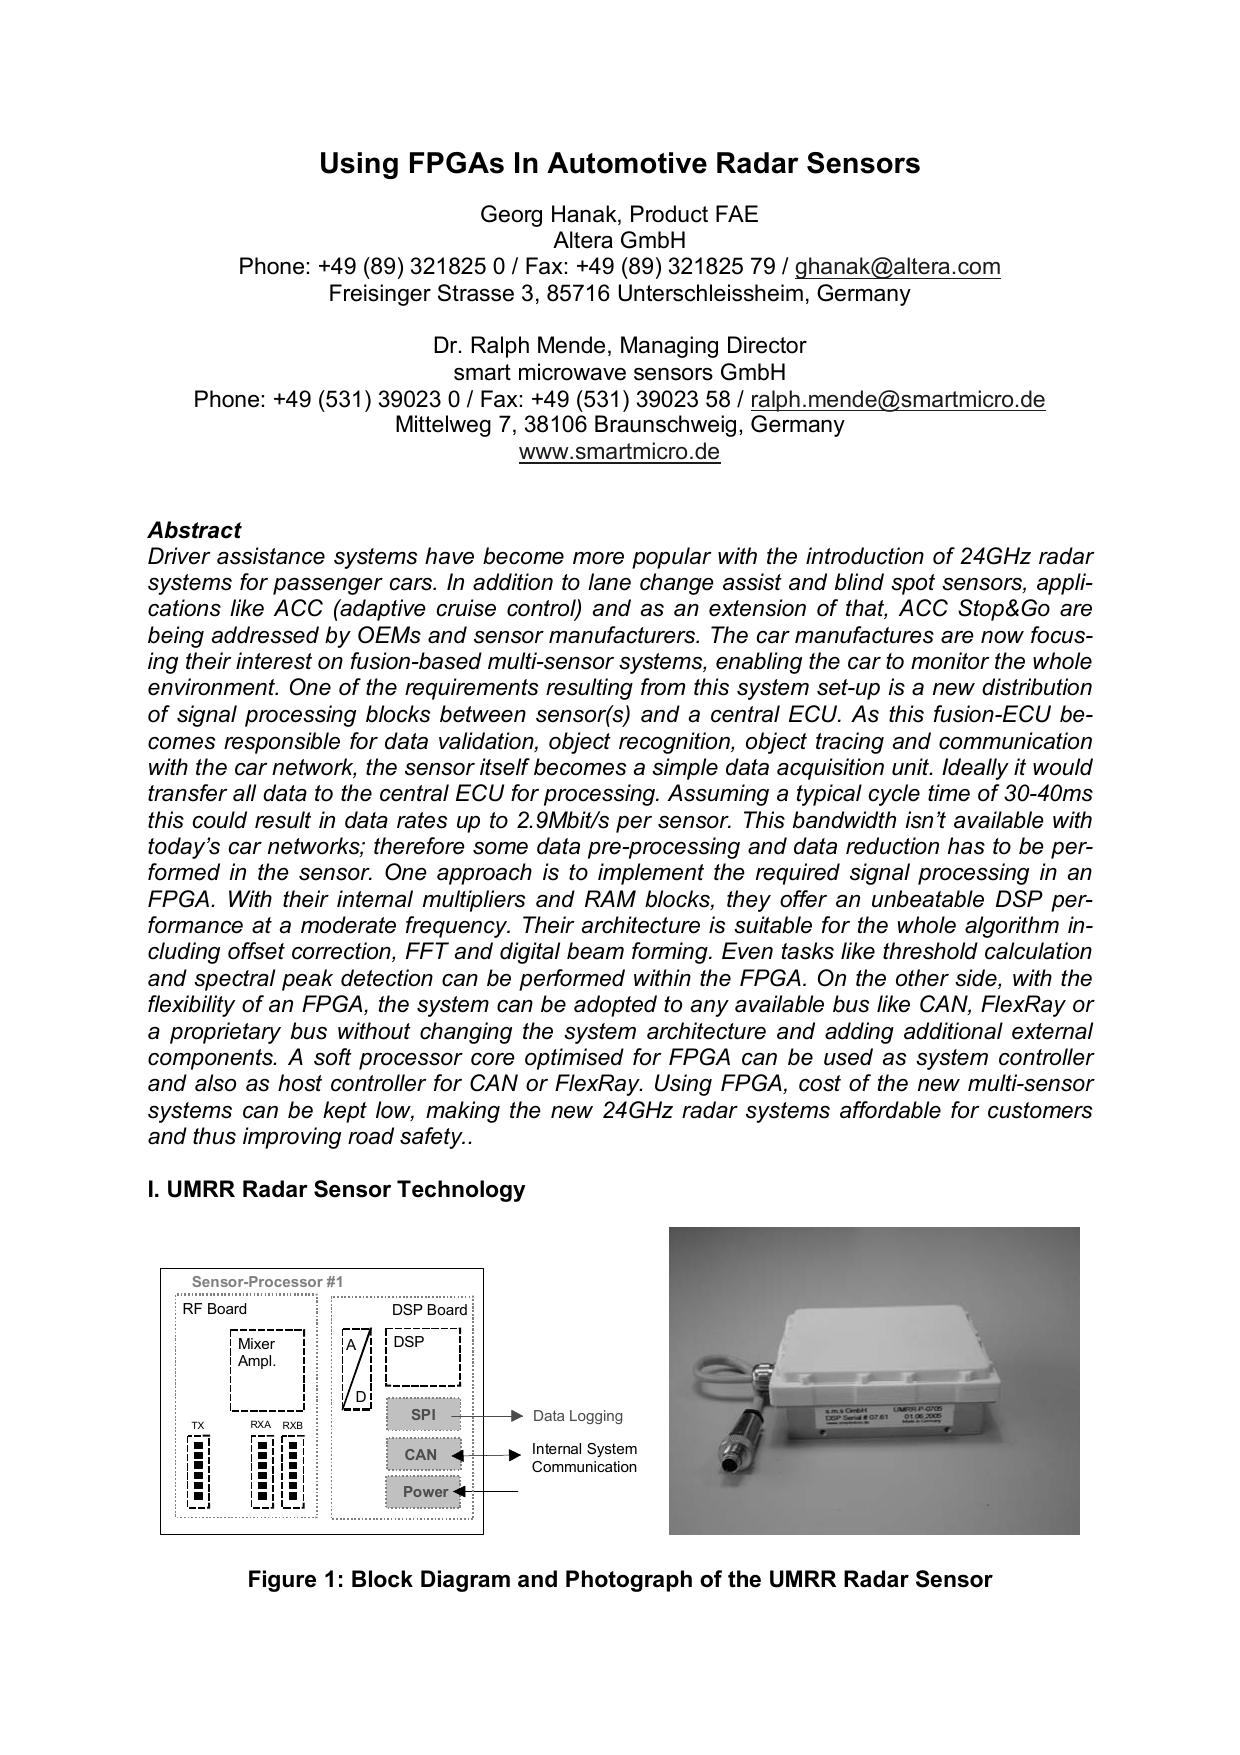 Using FPGAs In Automotive Radar Sensors | manualzz com